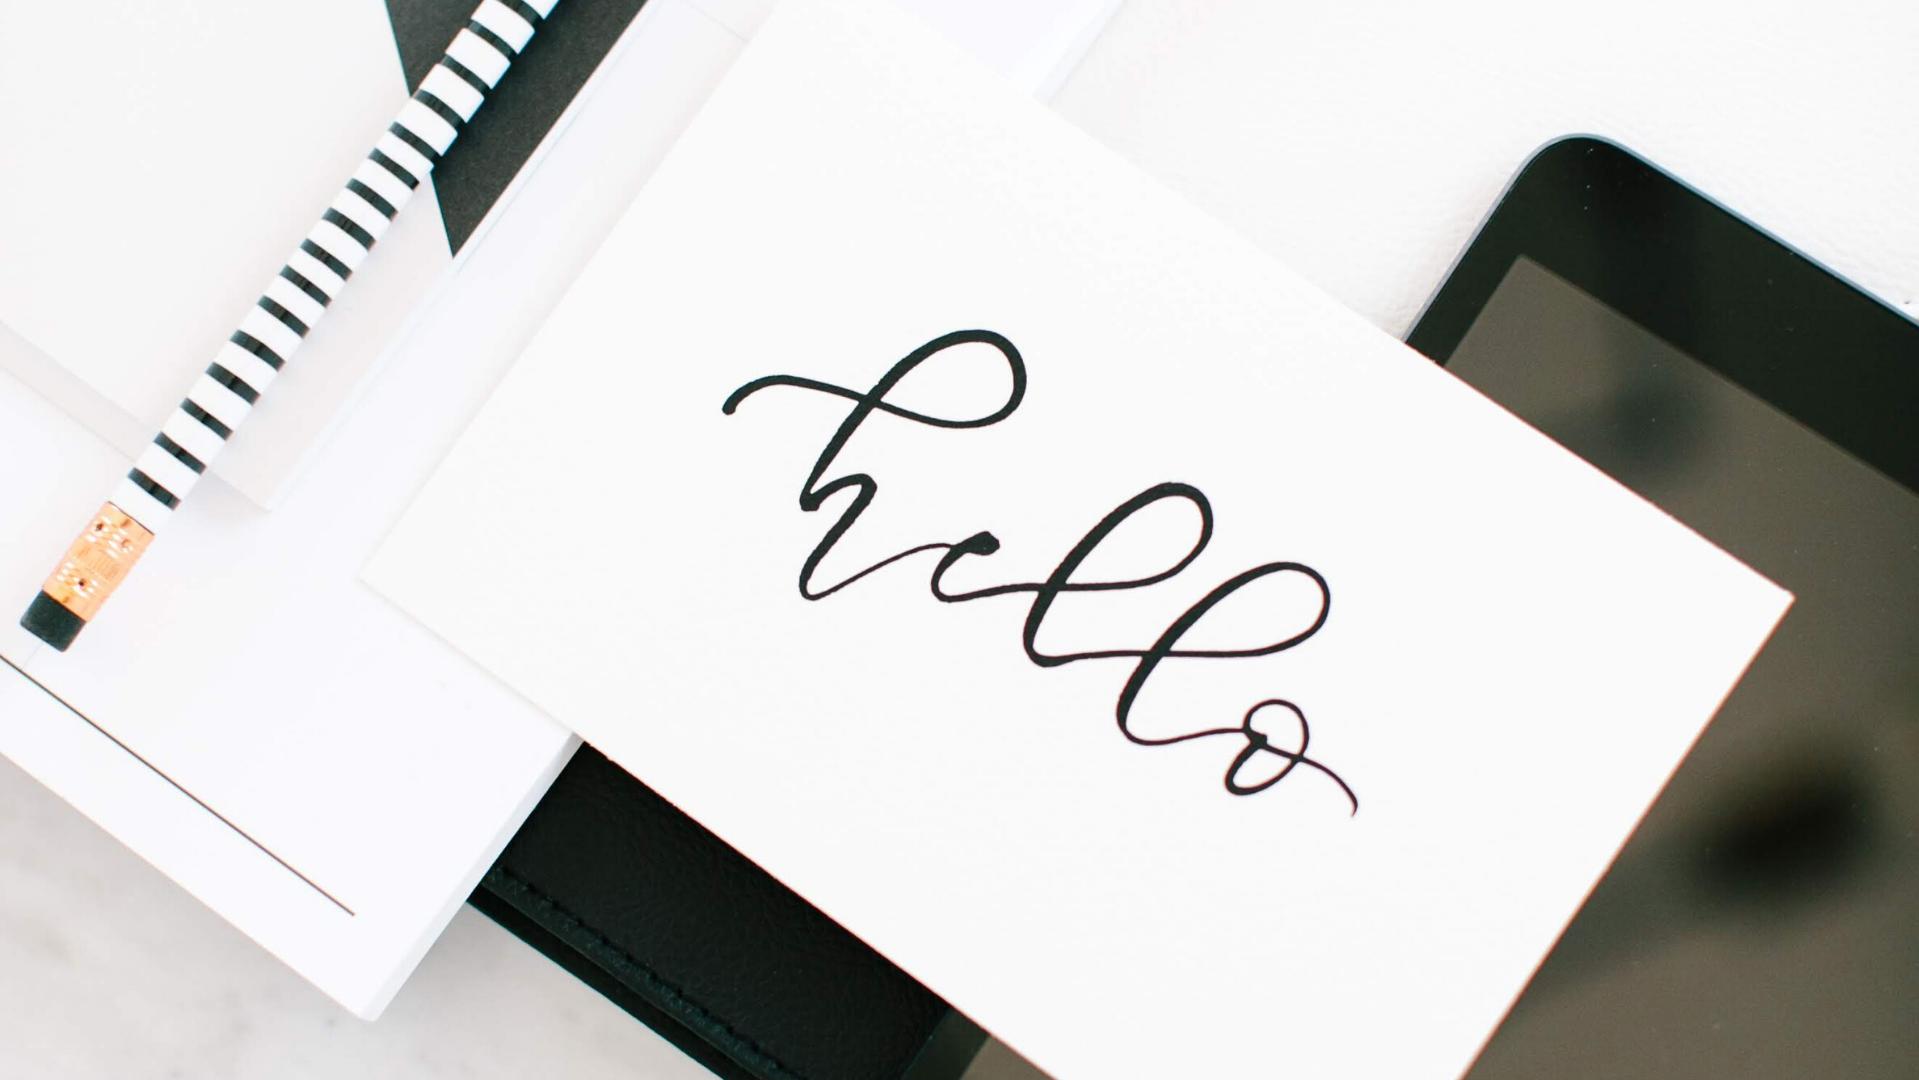 pencil, card and ipad